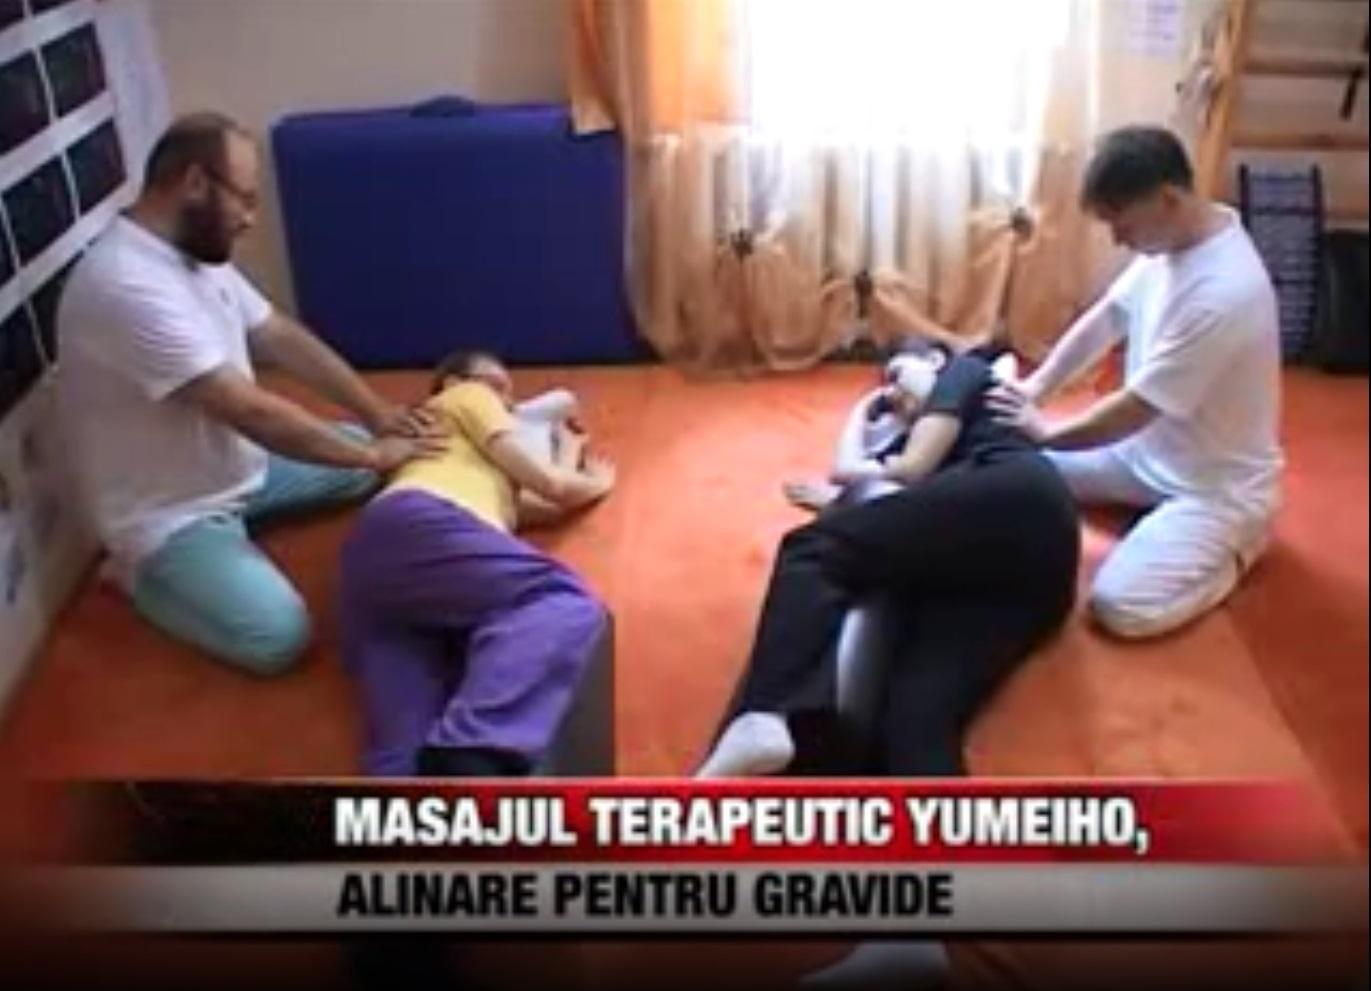 Alinare pentru gravide - Masaj terapeutic Yumeiho